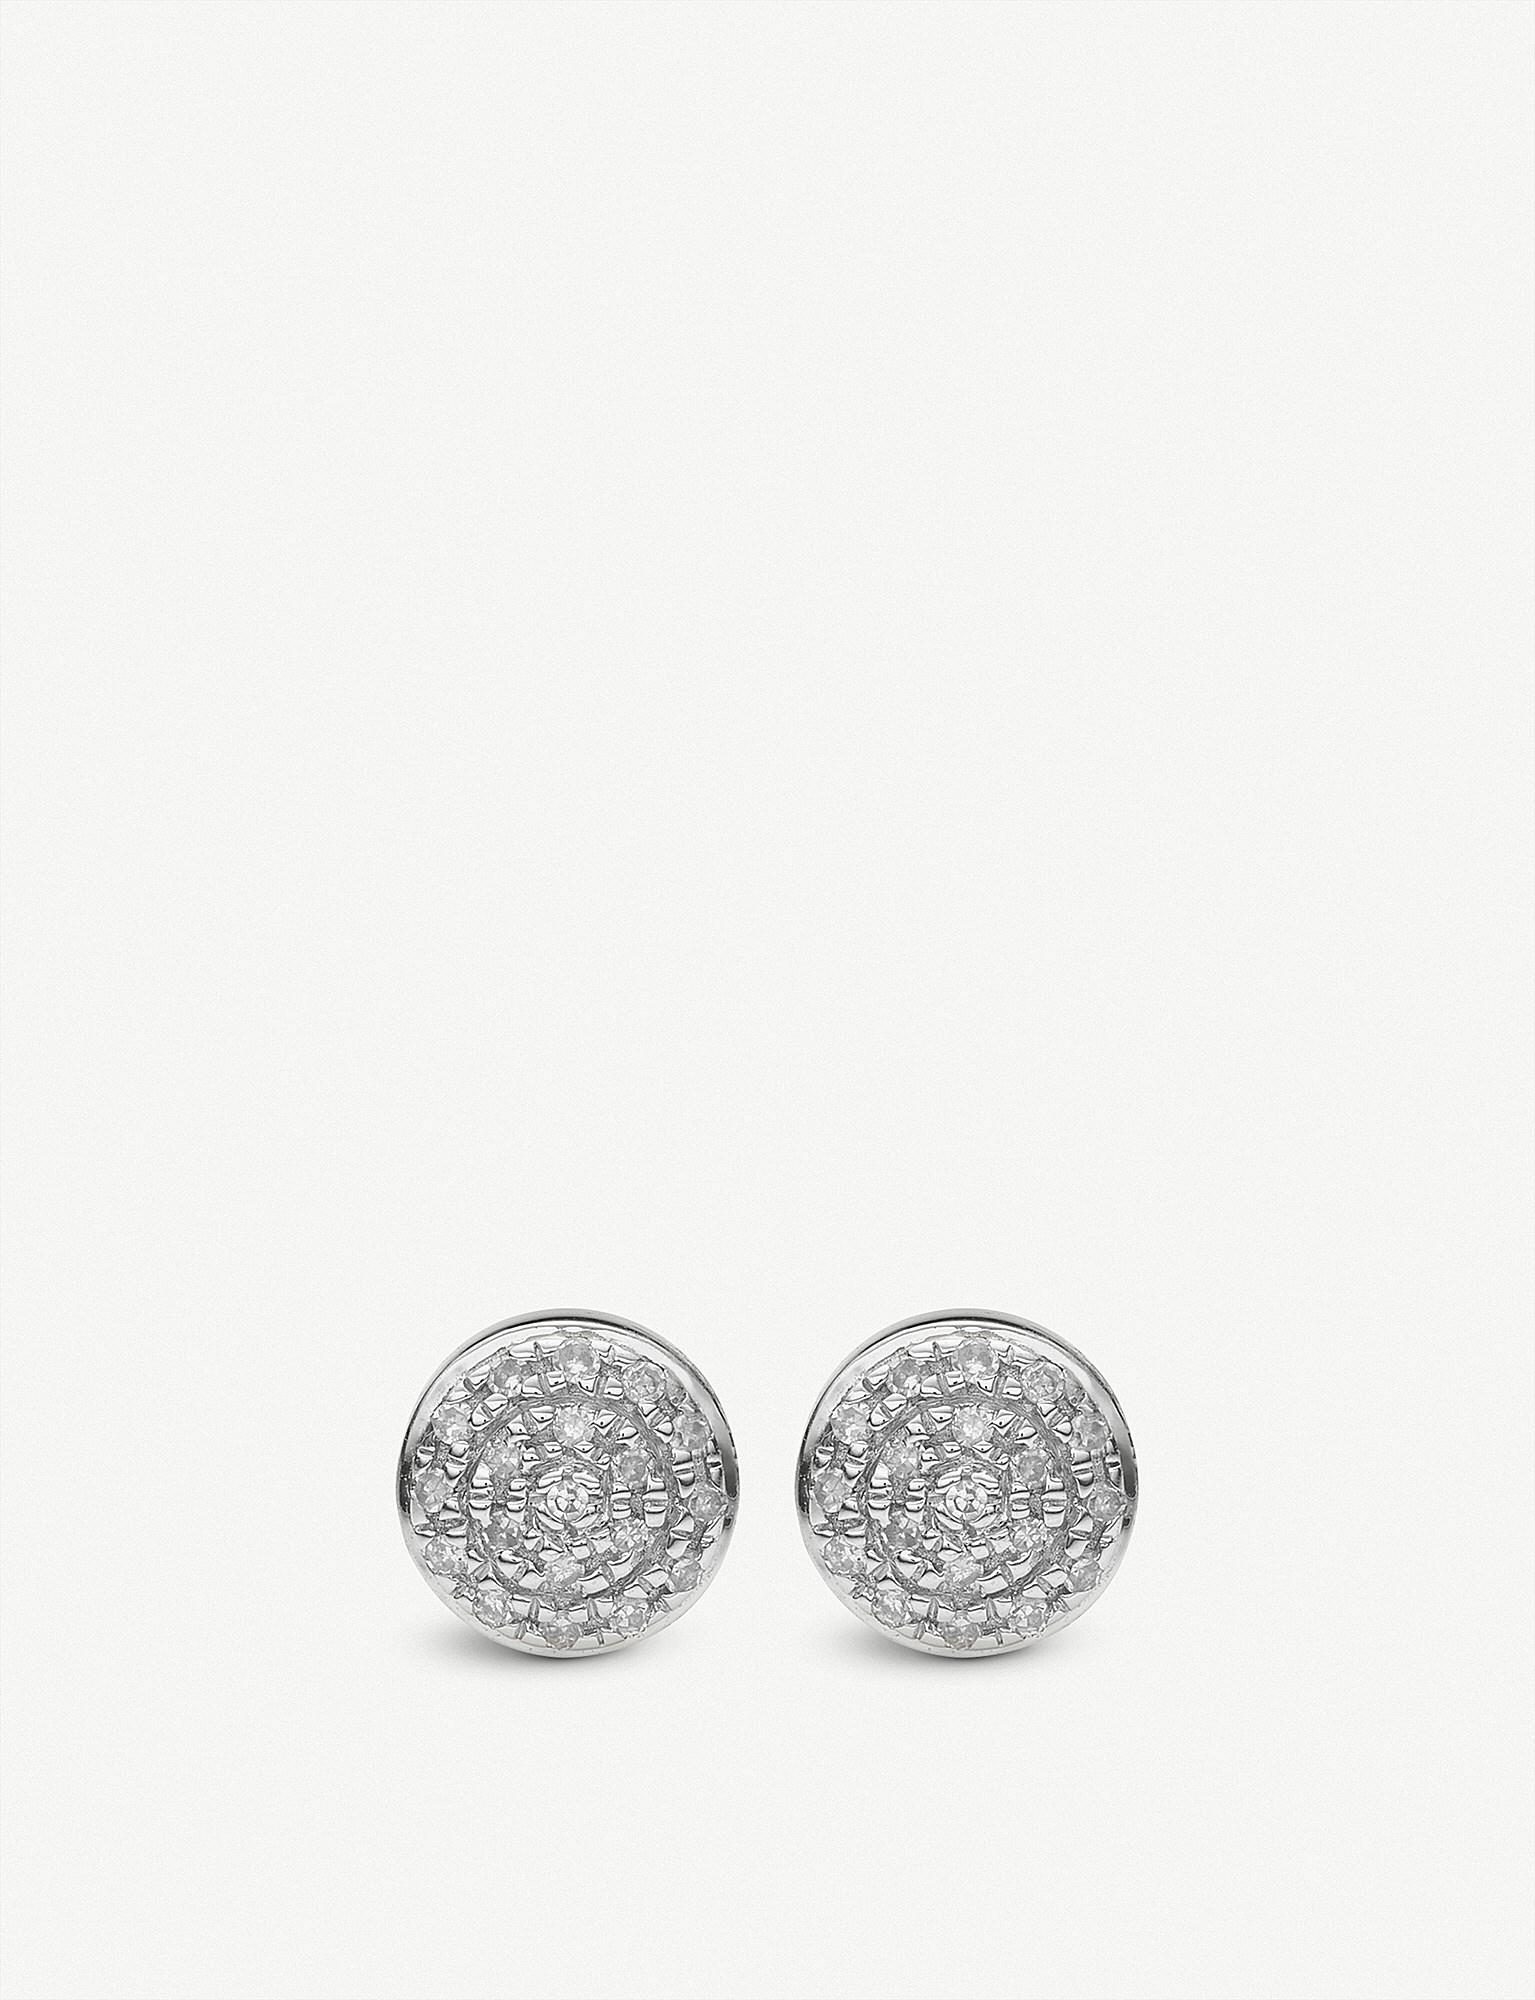 Sterling Silver Fiji Mini Button Stud Earrings Diamond Monica Vinader qKedPg1L